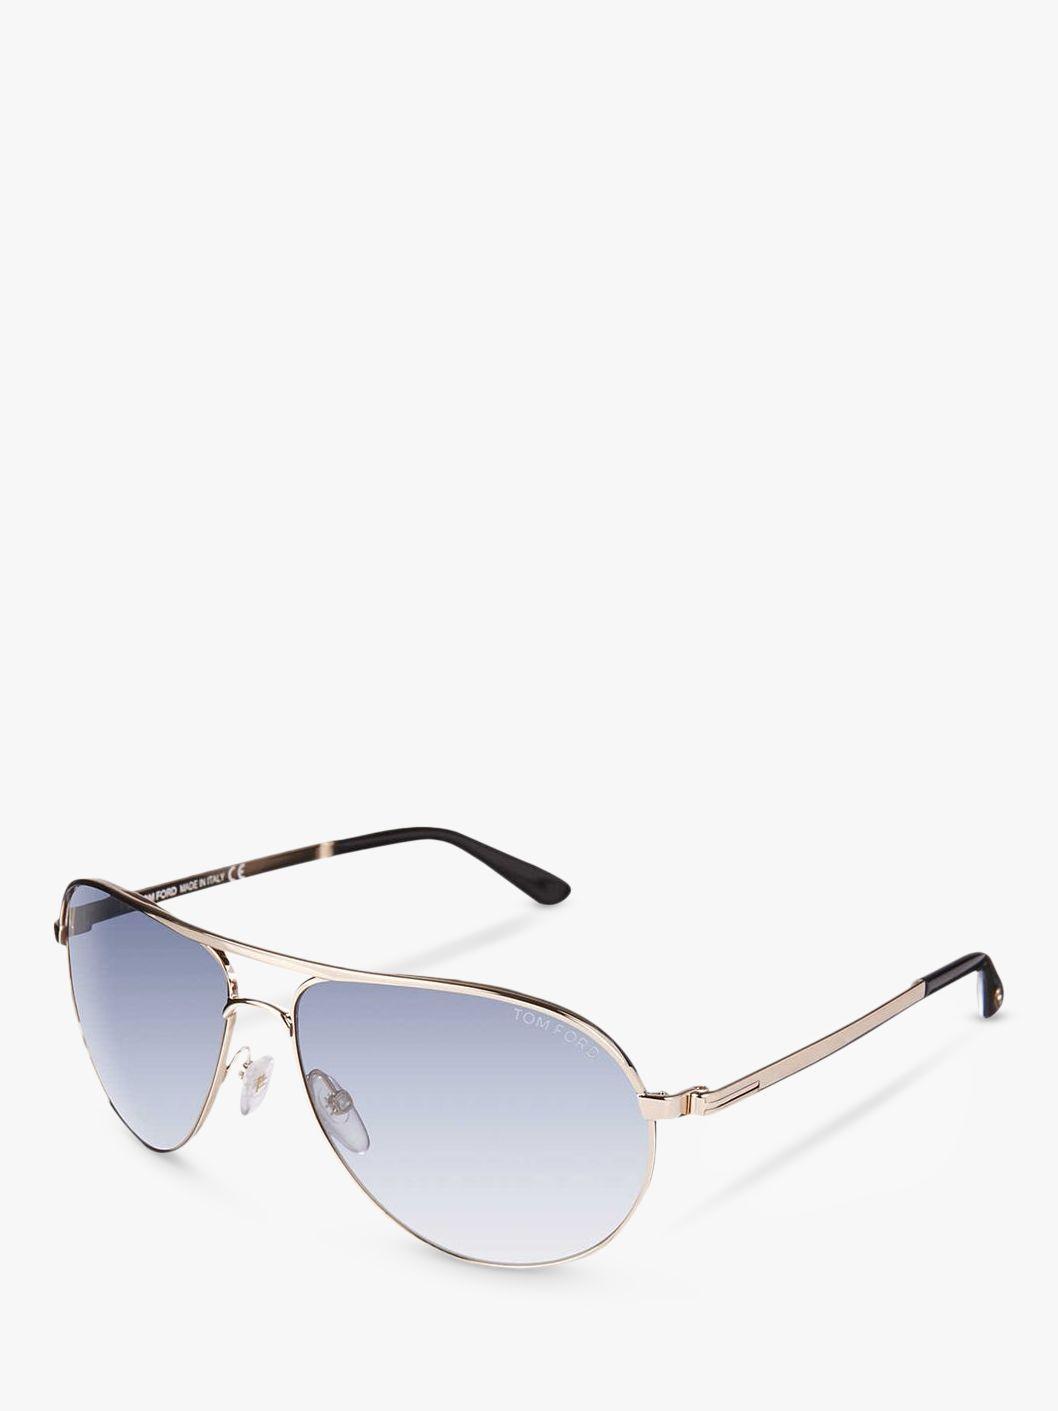 Tom Ford TOM FORD FT0144 Marko Aviator Sunglasses, Pale Blue